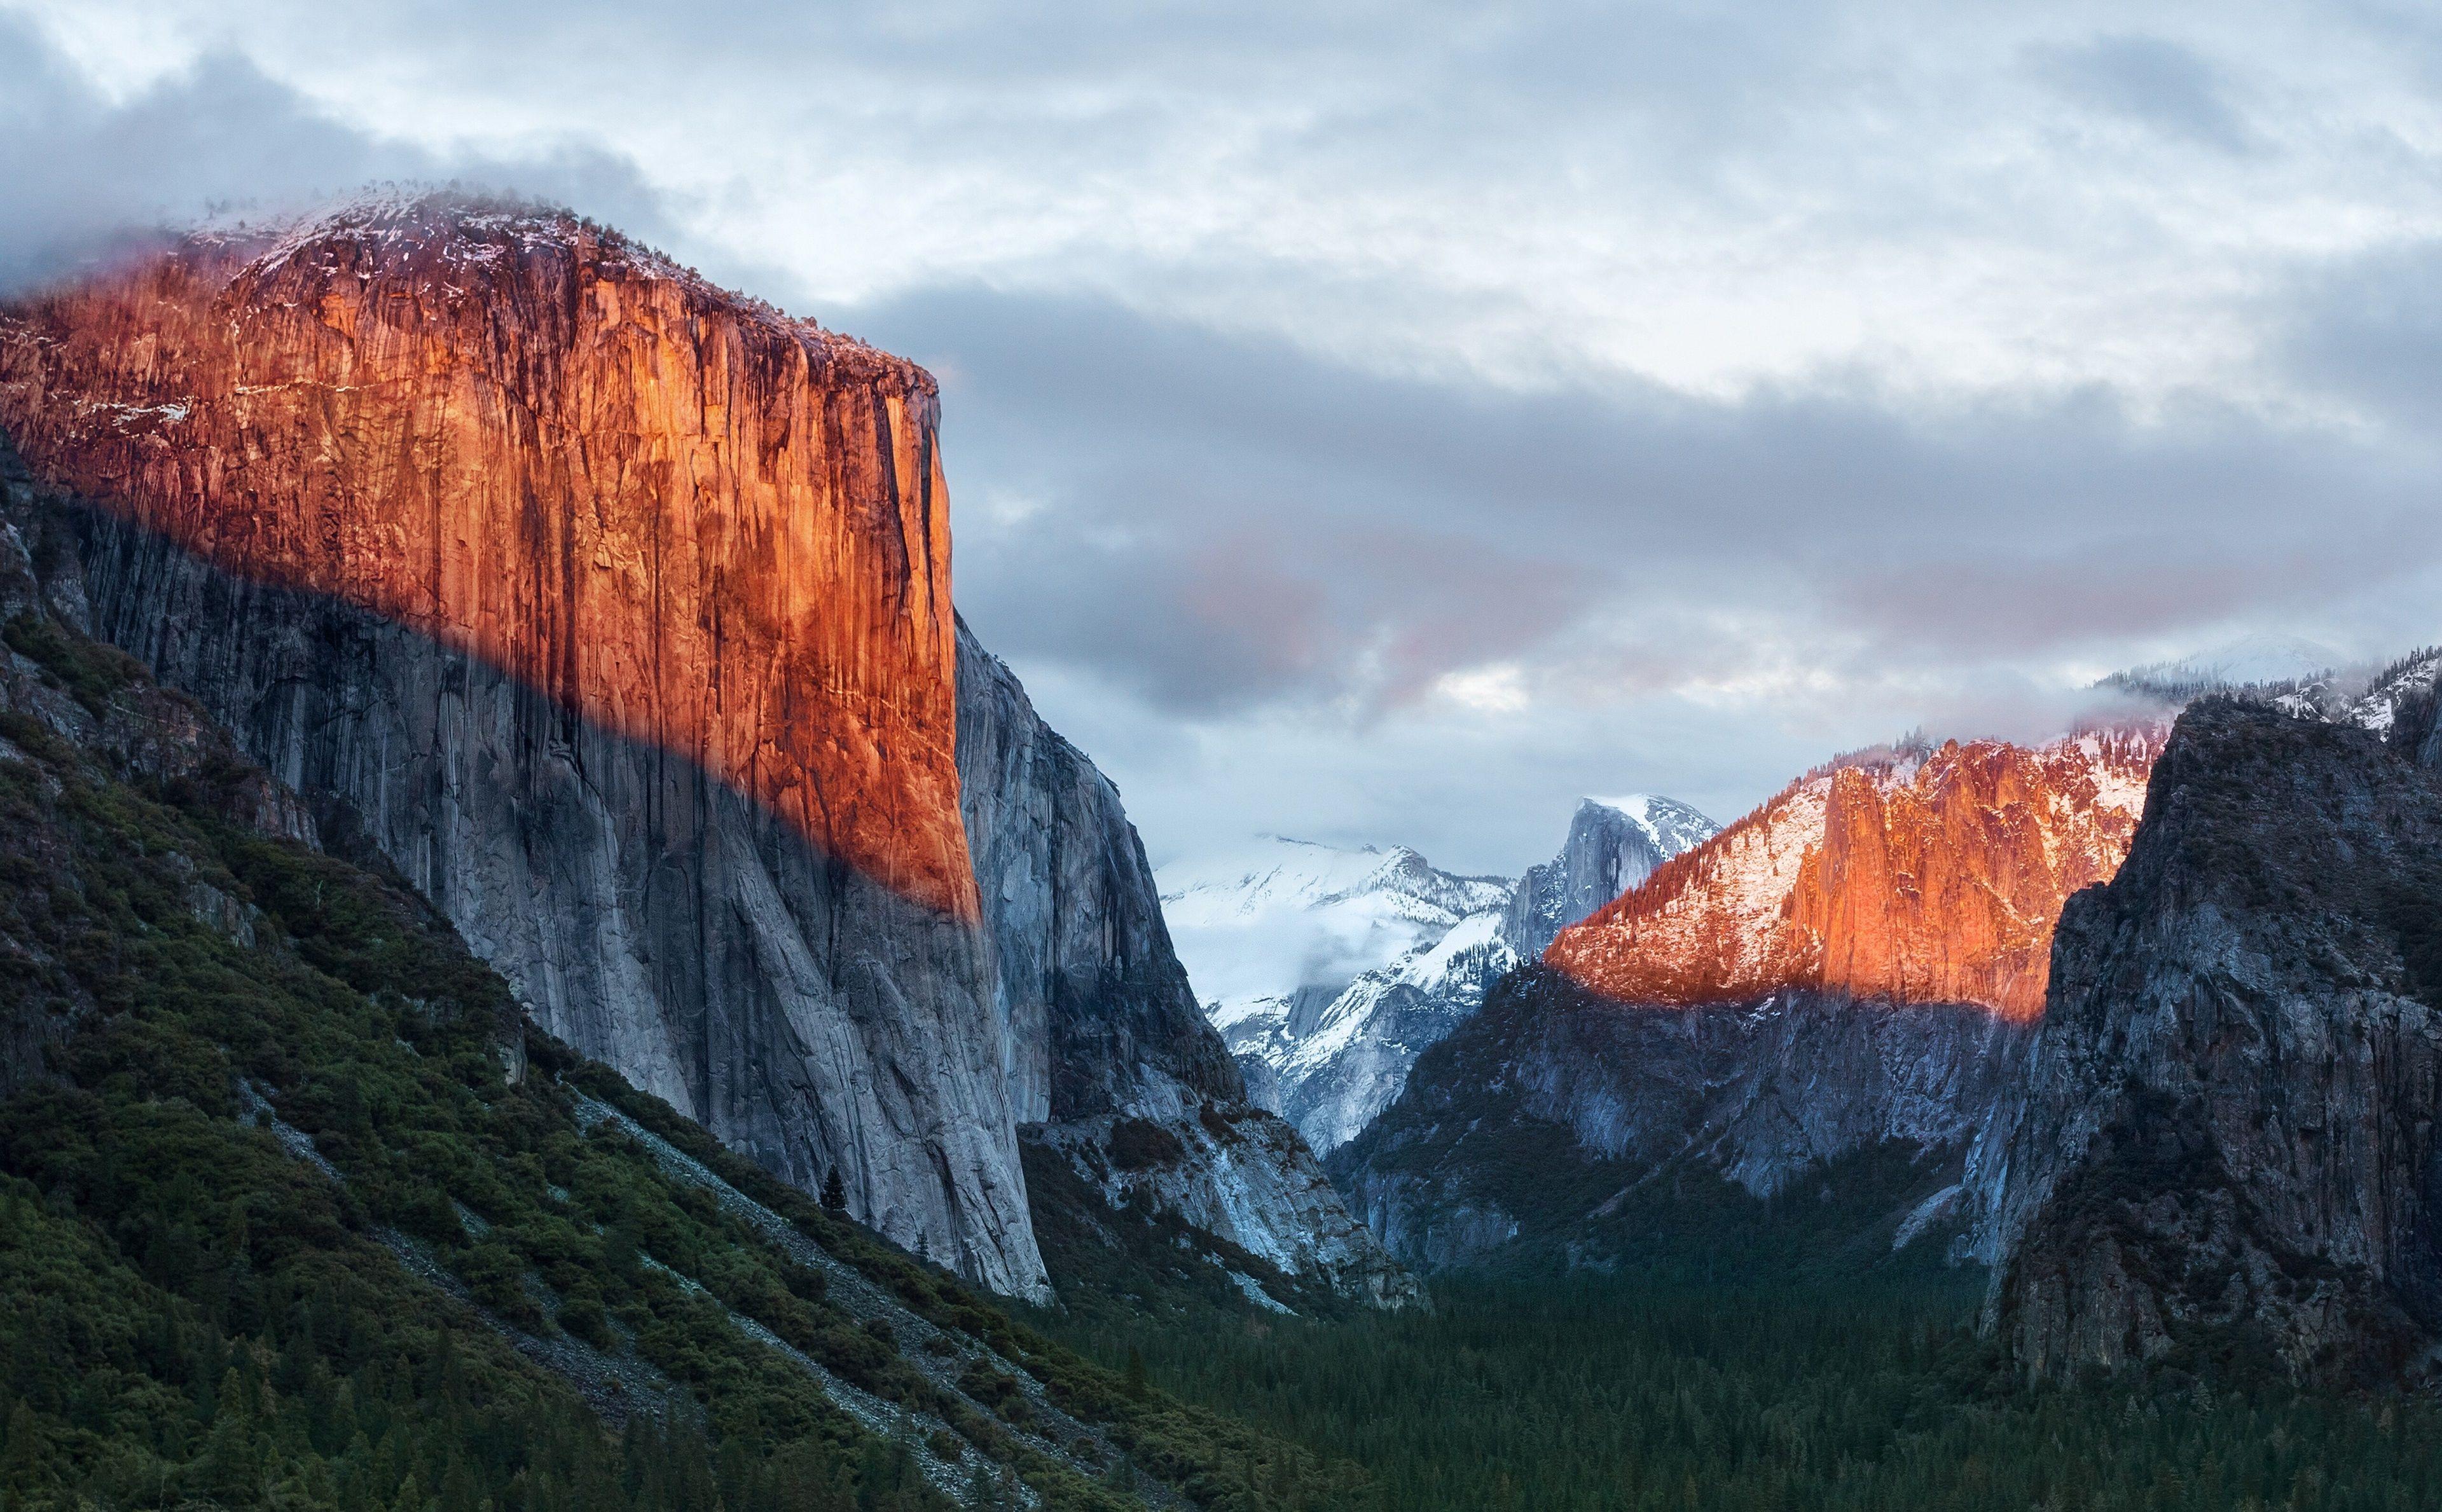 3840x2378 El Capitan 4k Wallpaper Free Download Osx Yosemite